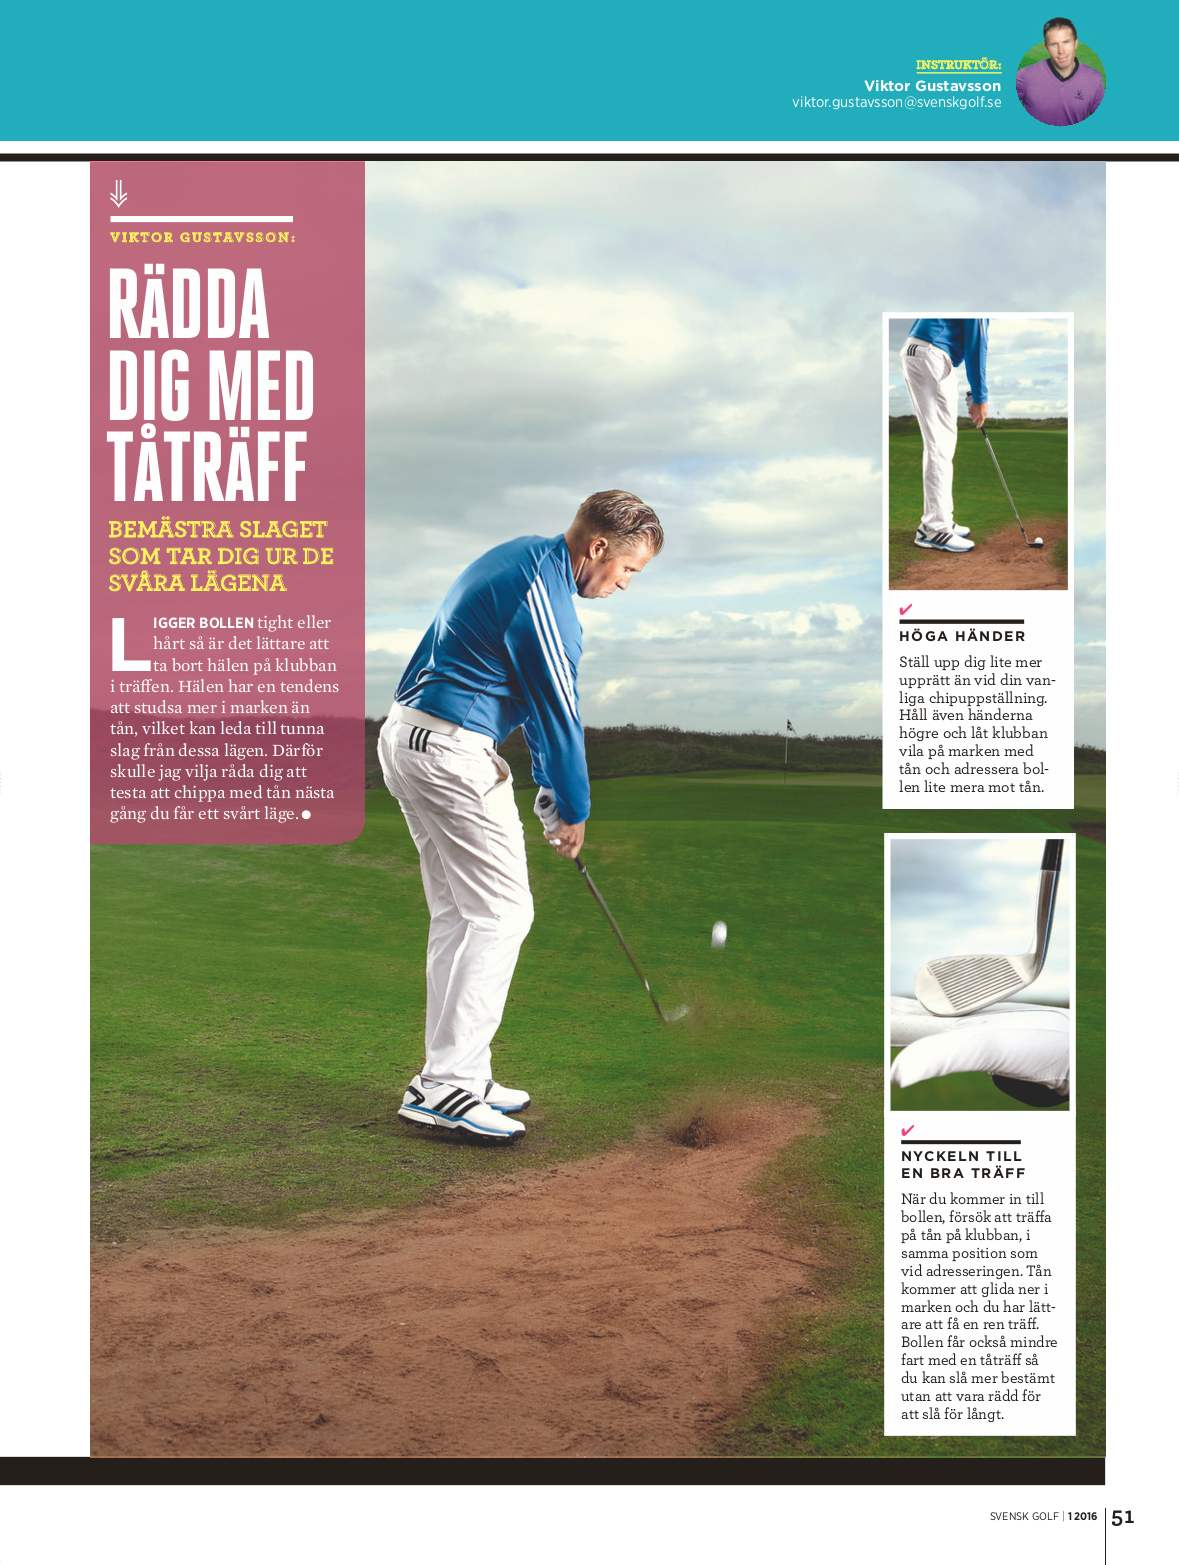 Sa langt efter ar svenska golfare